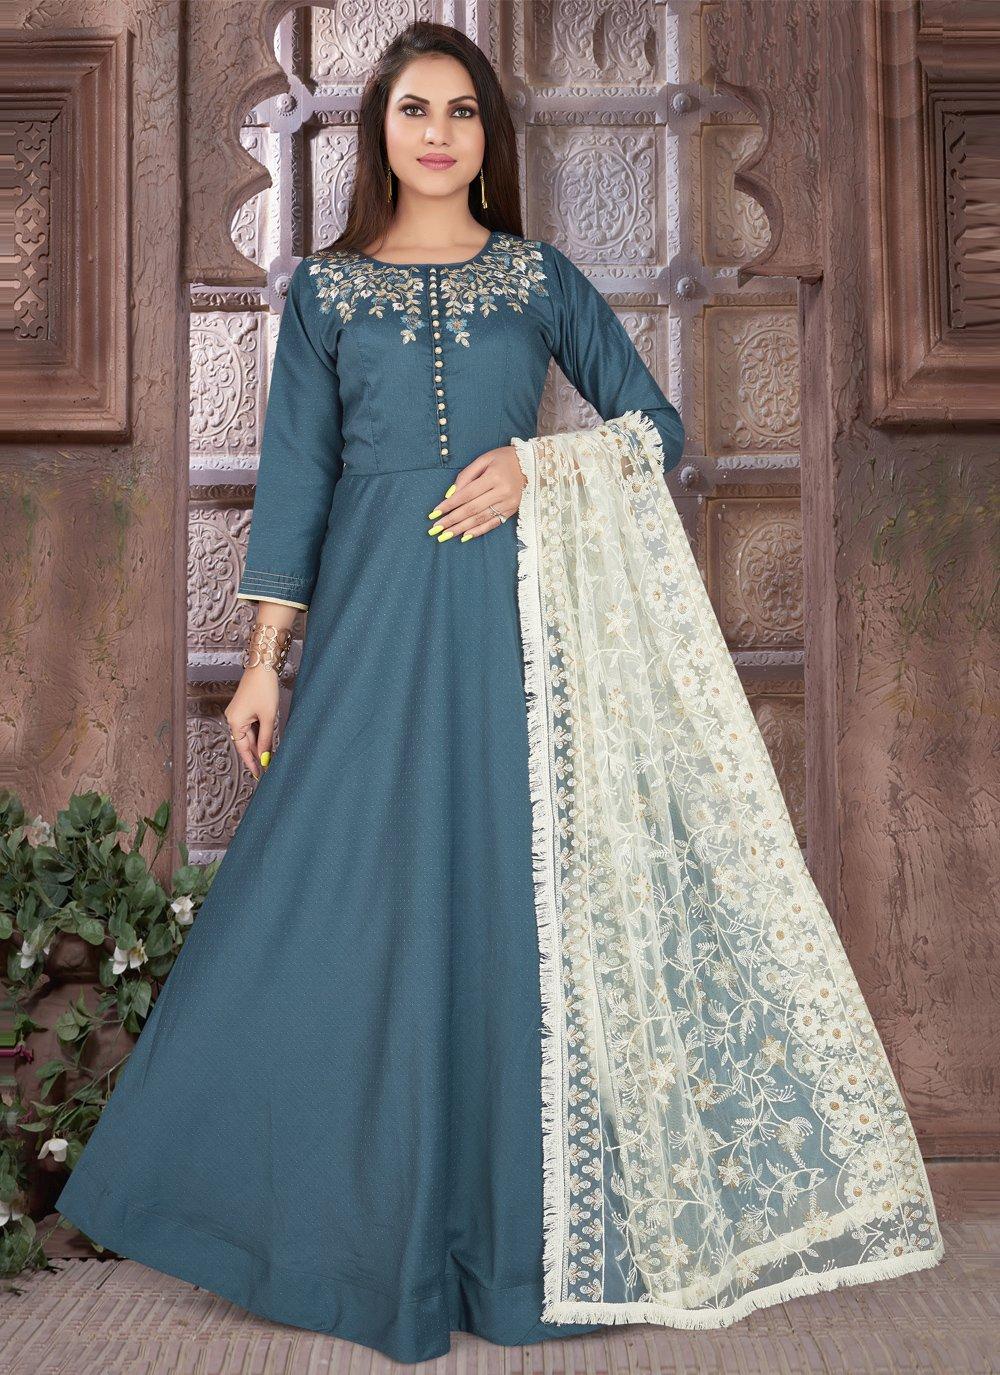 Blue Sangeet Readymade Suit